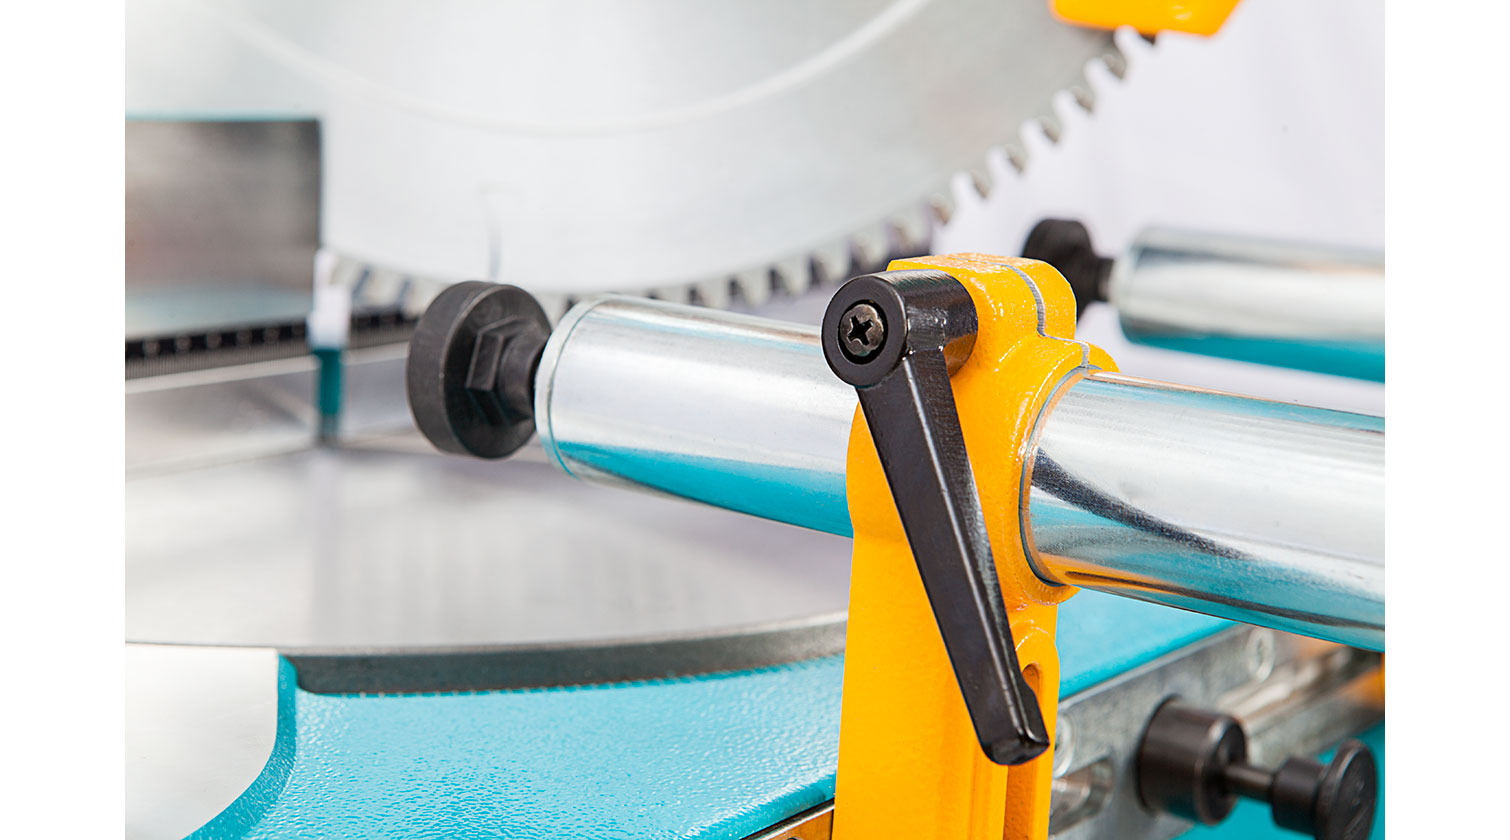 INT aluminum chop saw Yilmaz KD 400 PS horizontal clamping